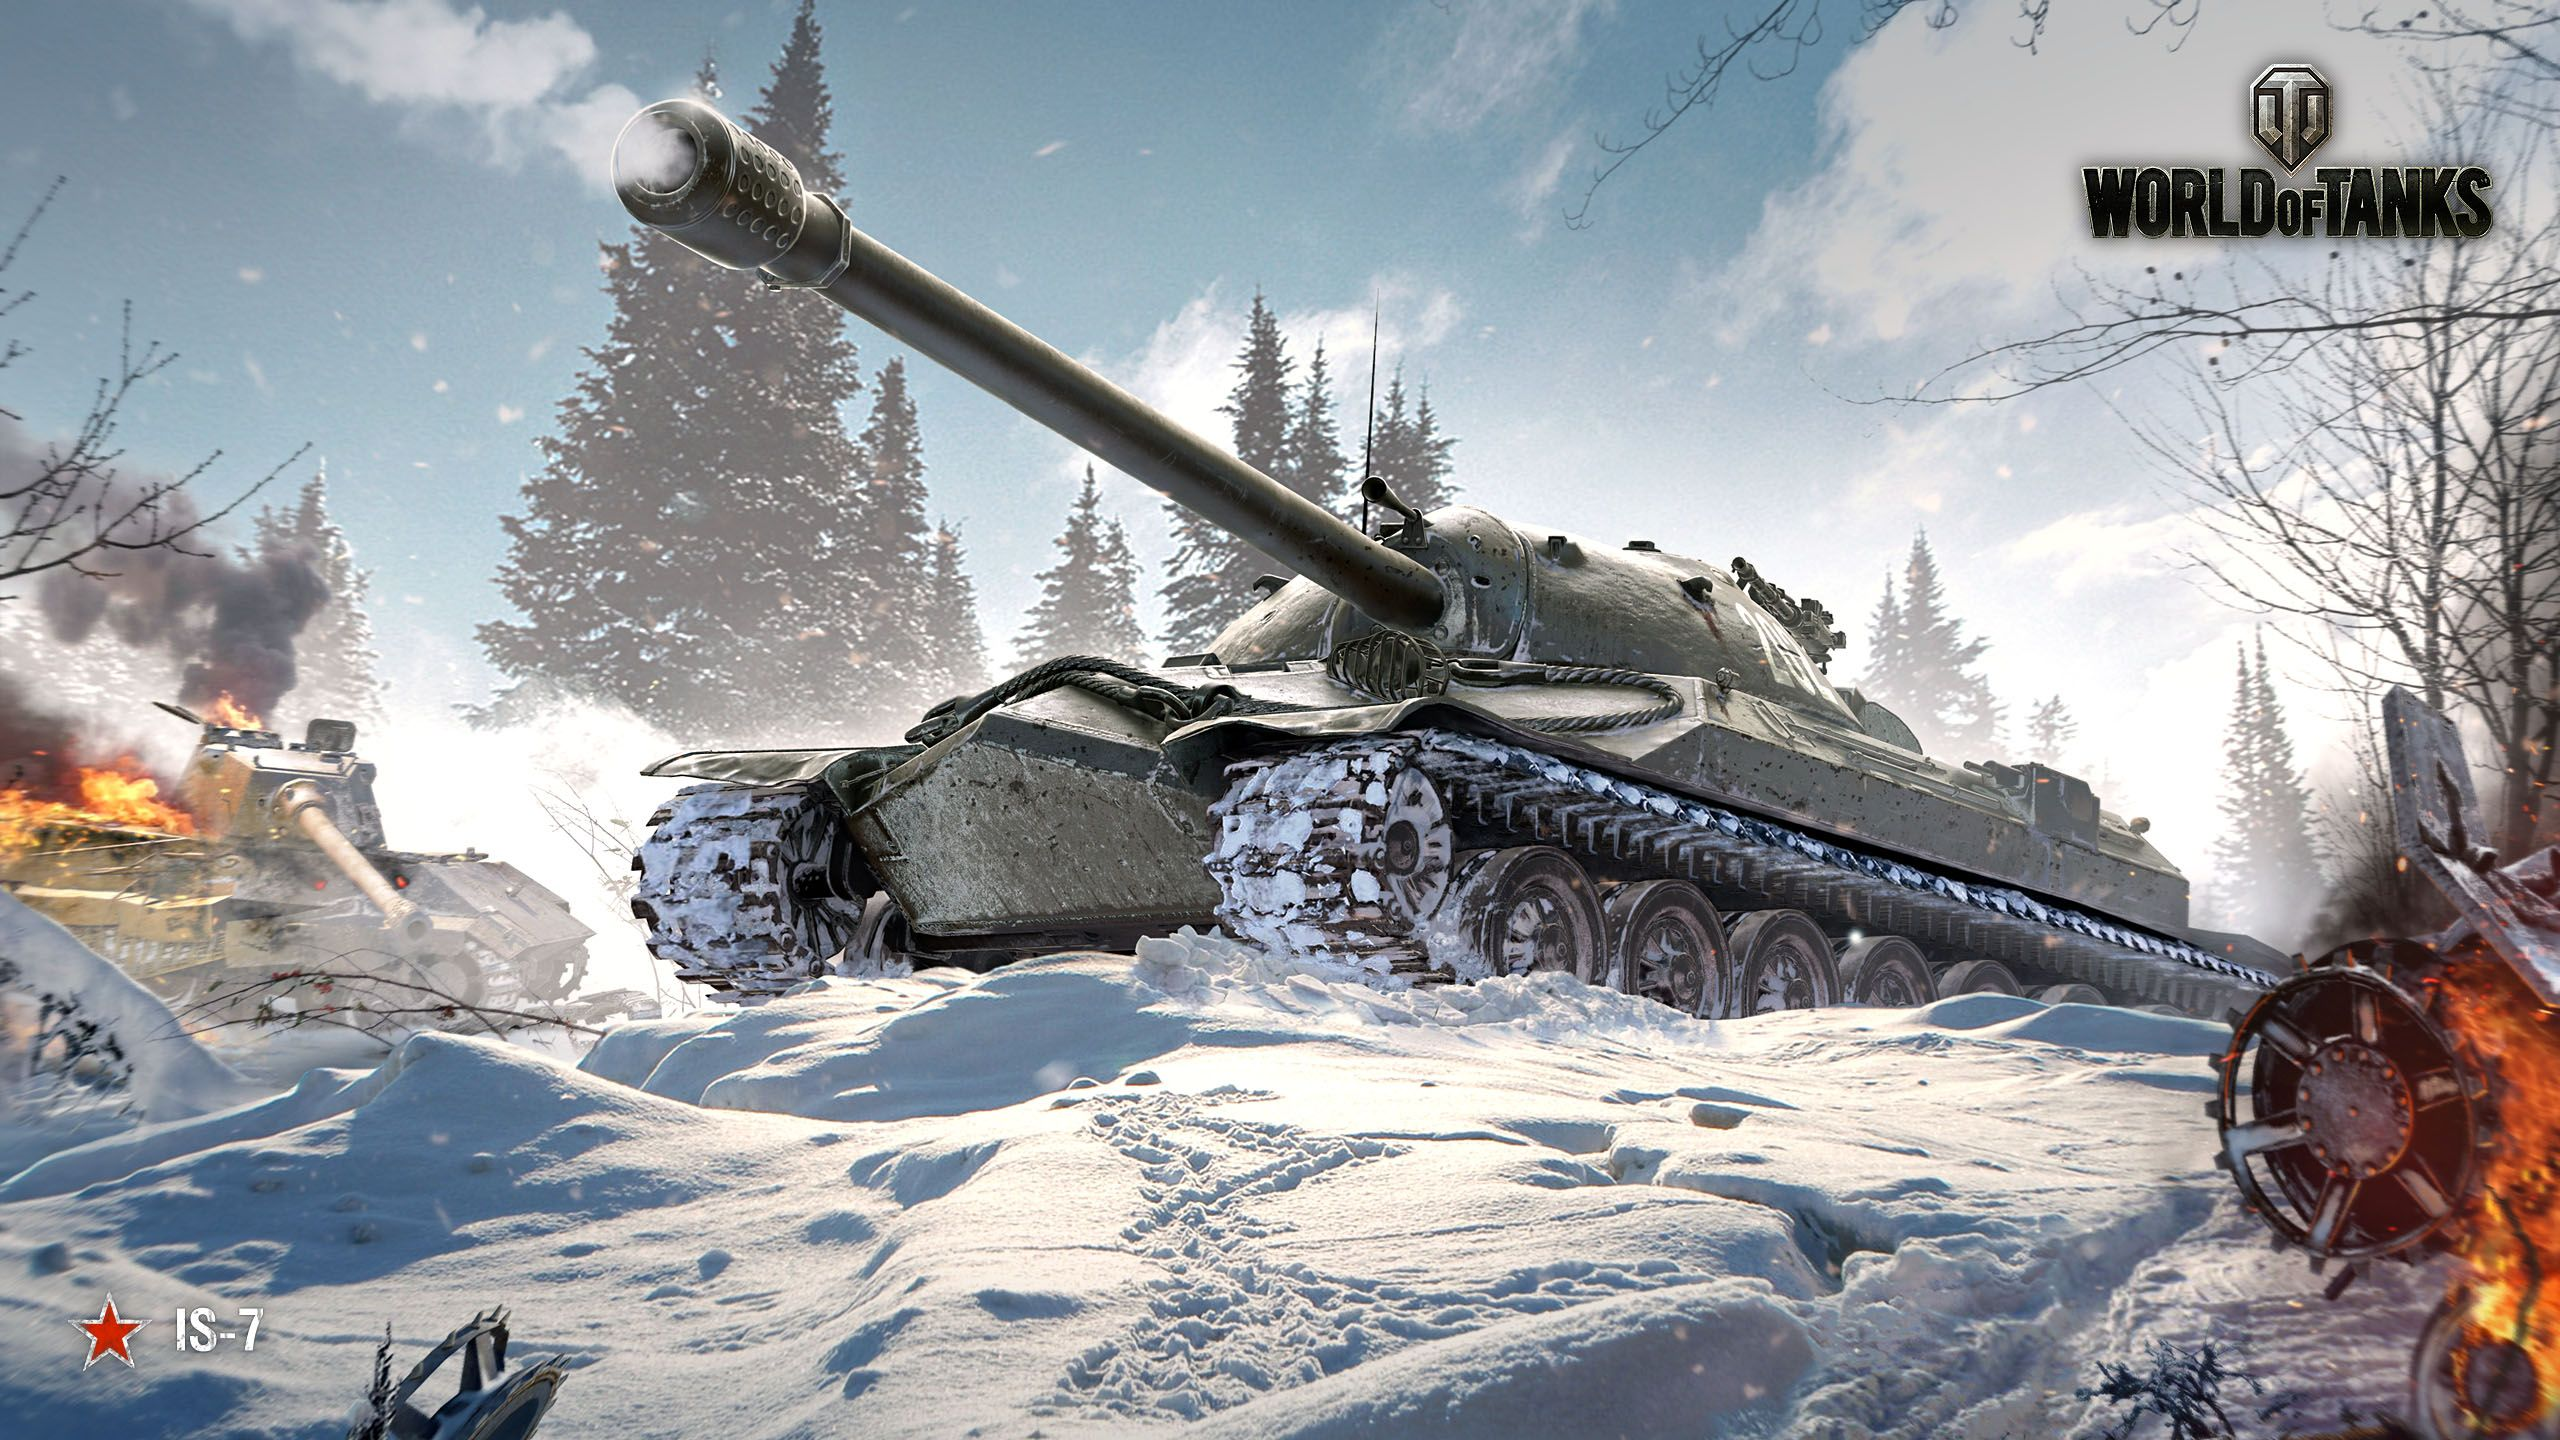 Pin by Sam Z. on World of Tanks Tank wallpaper, World of